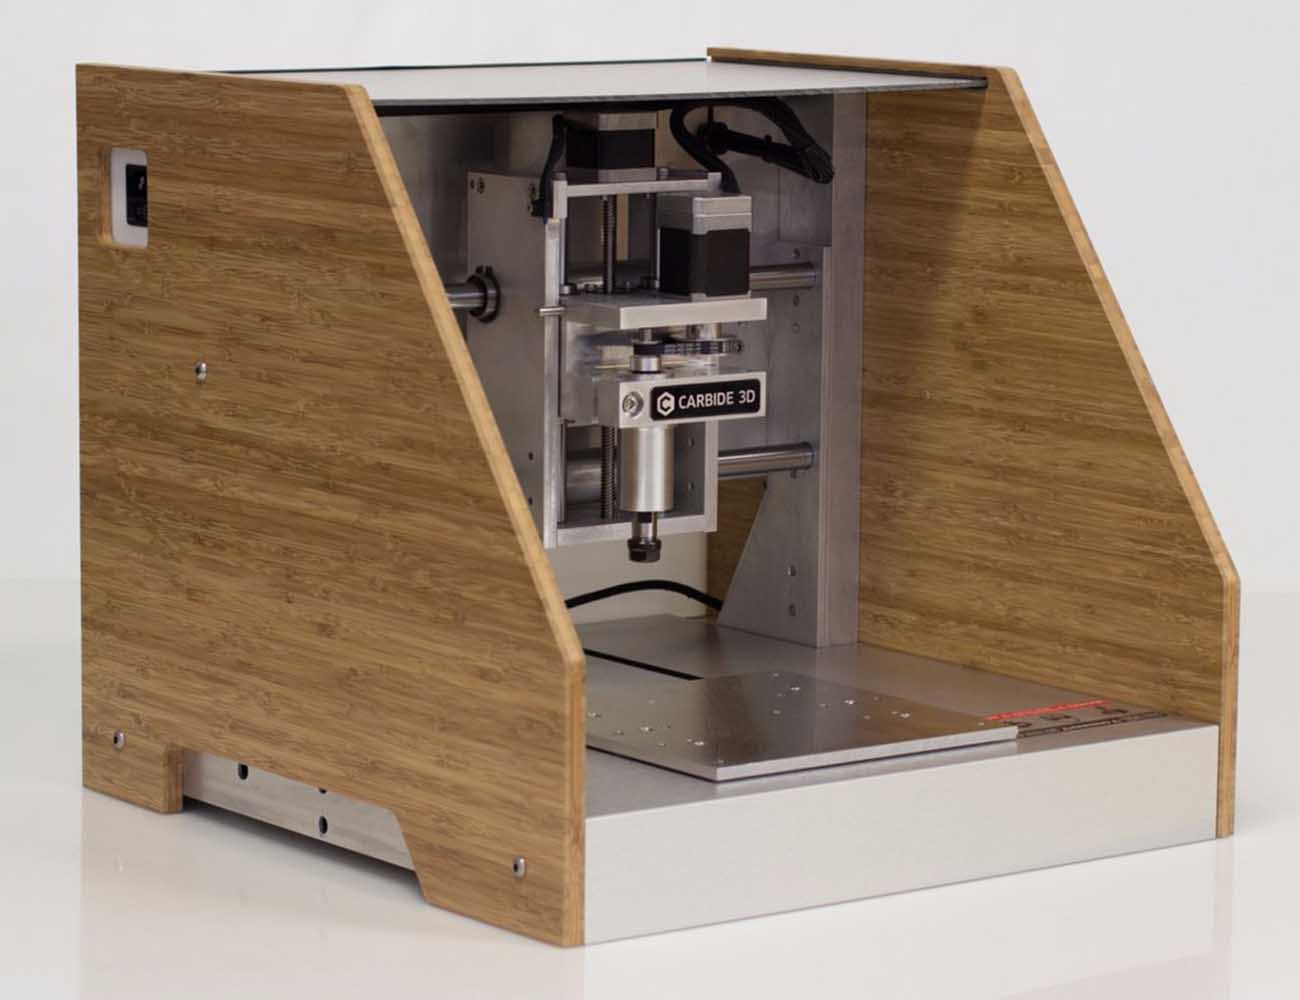 Nomad 883 – Compact Desktop CNC Mill